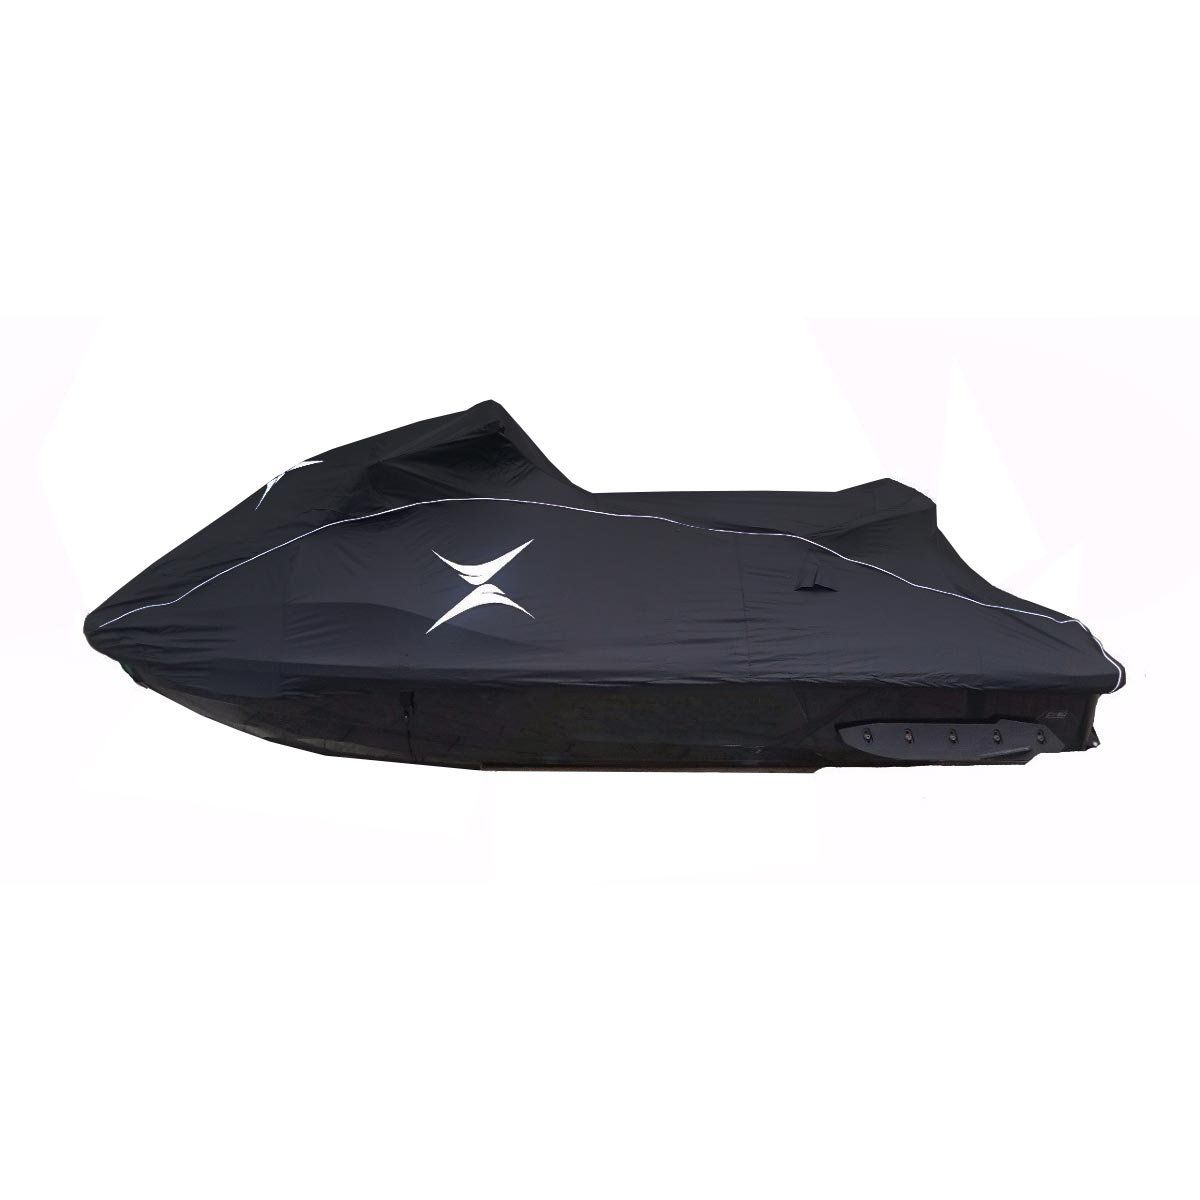 CAPA RXT-GTX-WAKE PRO 2015